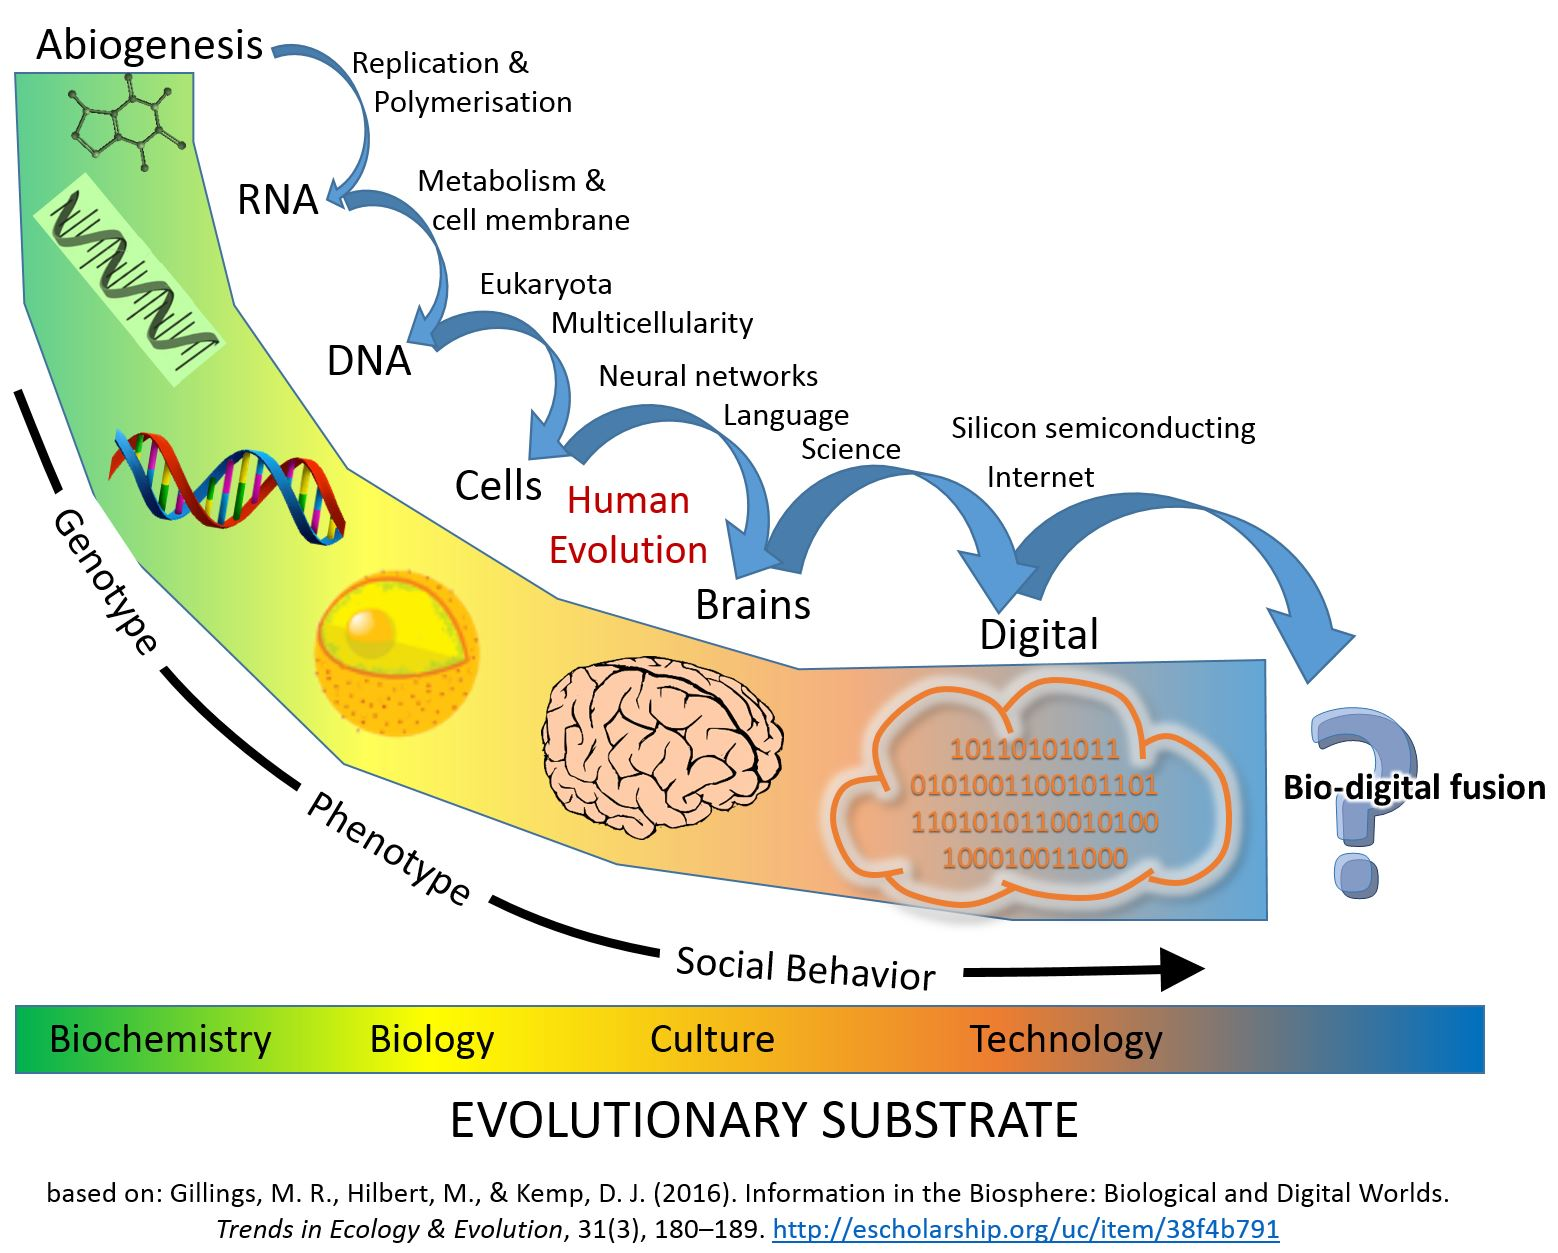 https://i0.wp.com/shivashaktibhava.files.wordpress.com/2018/04/major_evolutionary_transitions_digital.jpg?ssl=1&w=450